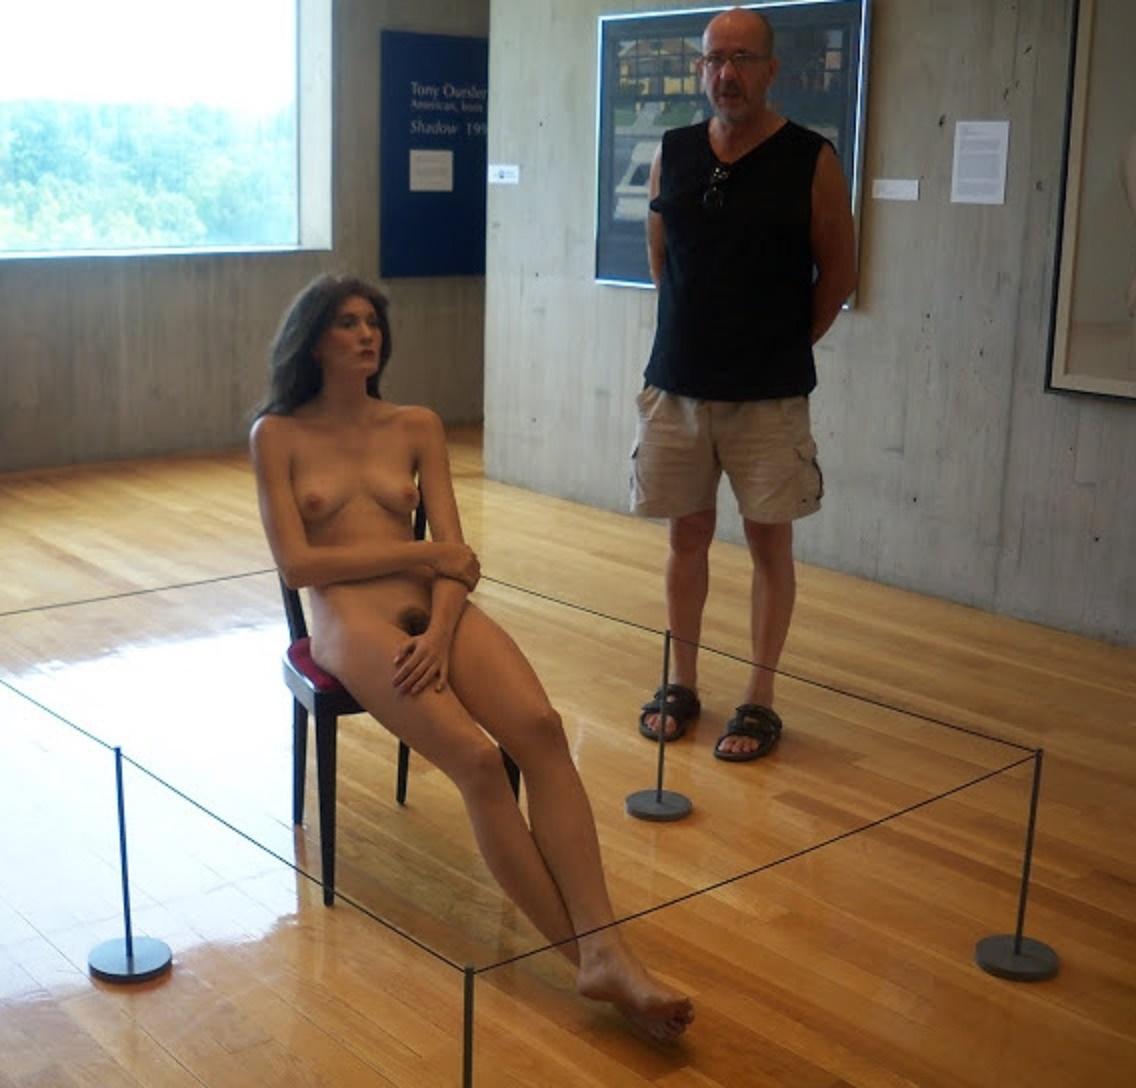 JOHNSON MUSEUM CORNELL UNIVERSITY NY